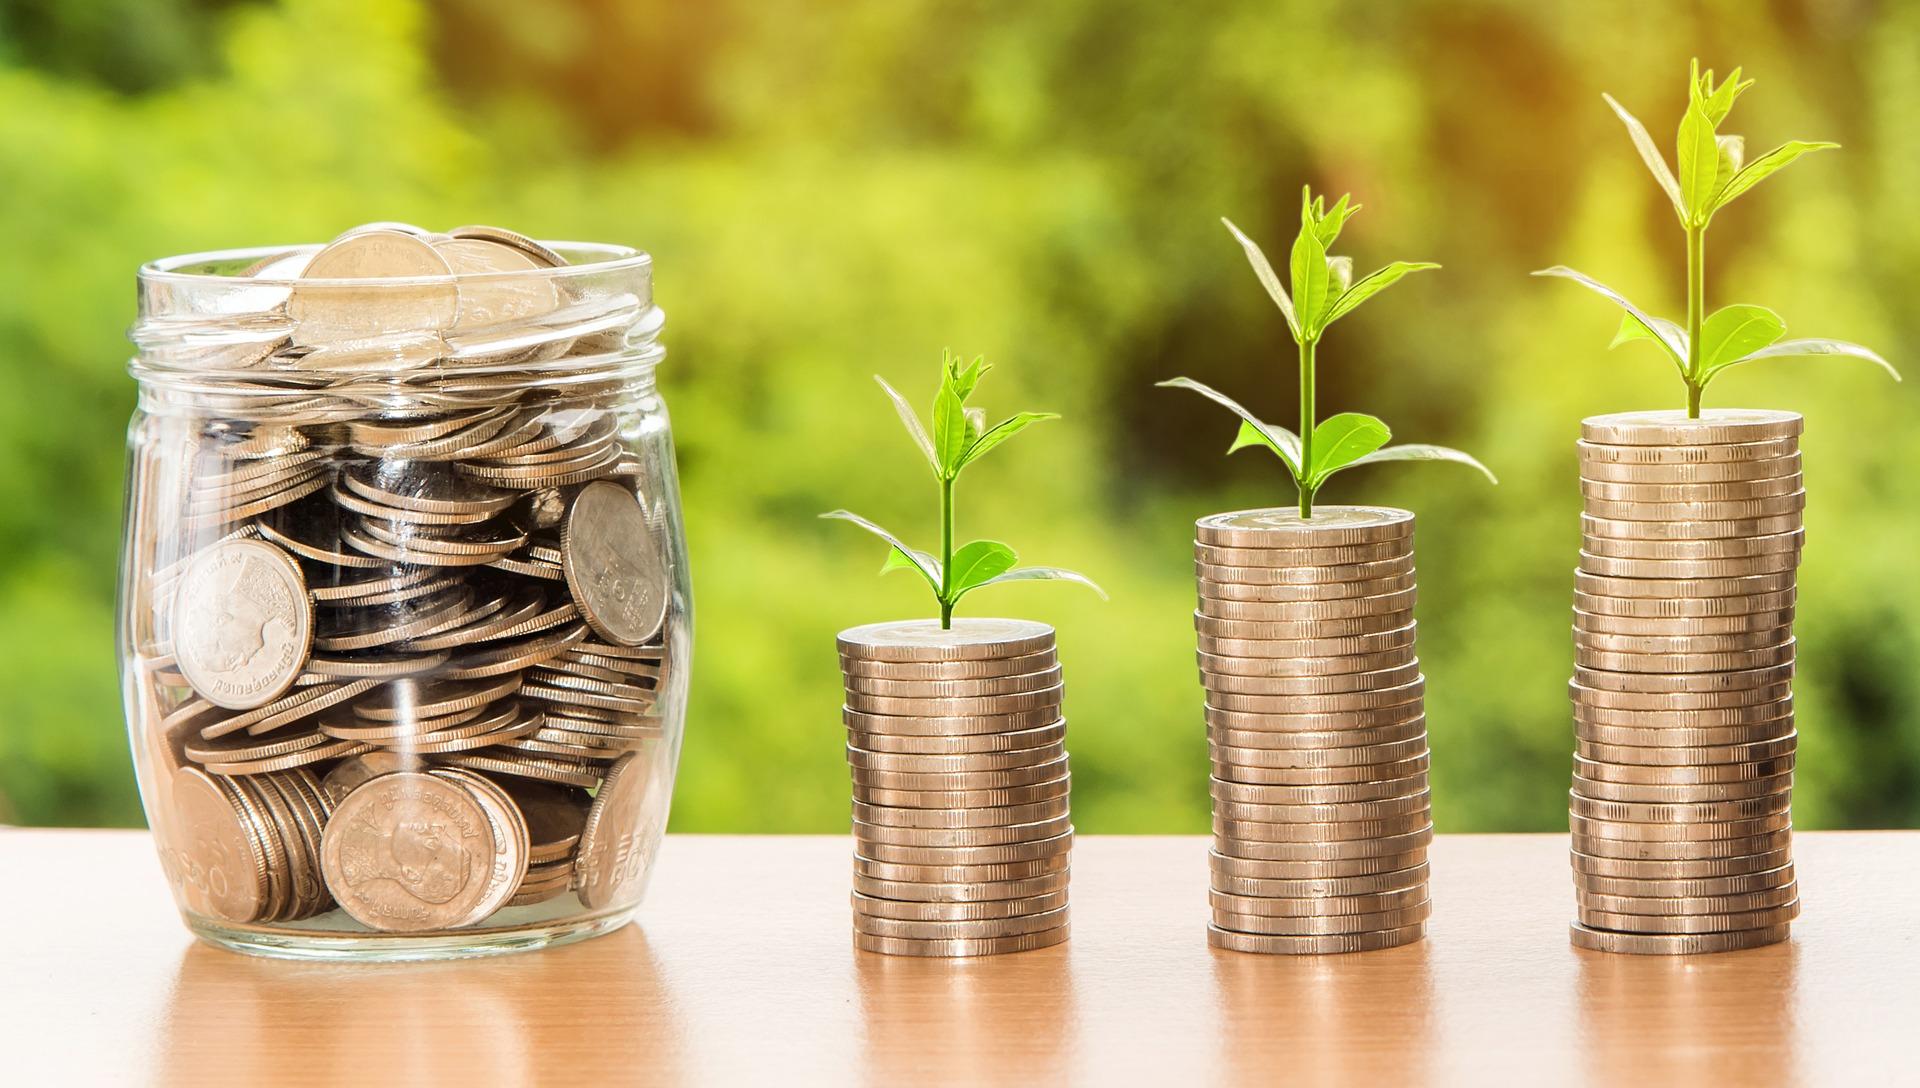 The Goldilocks Principle and Banking